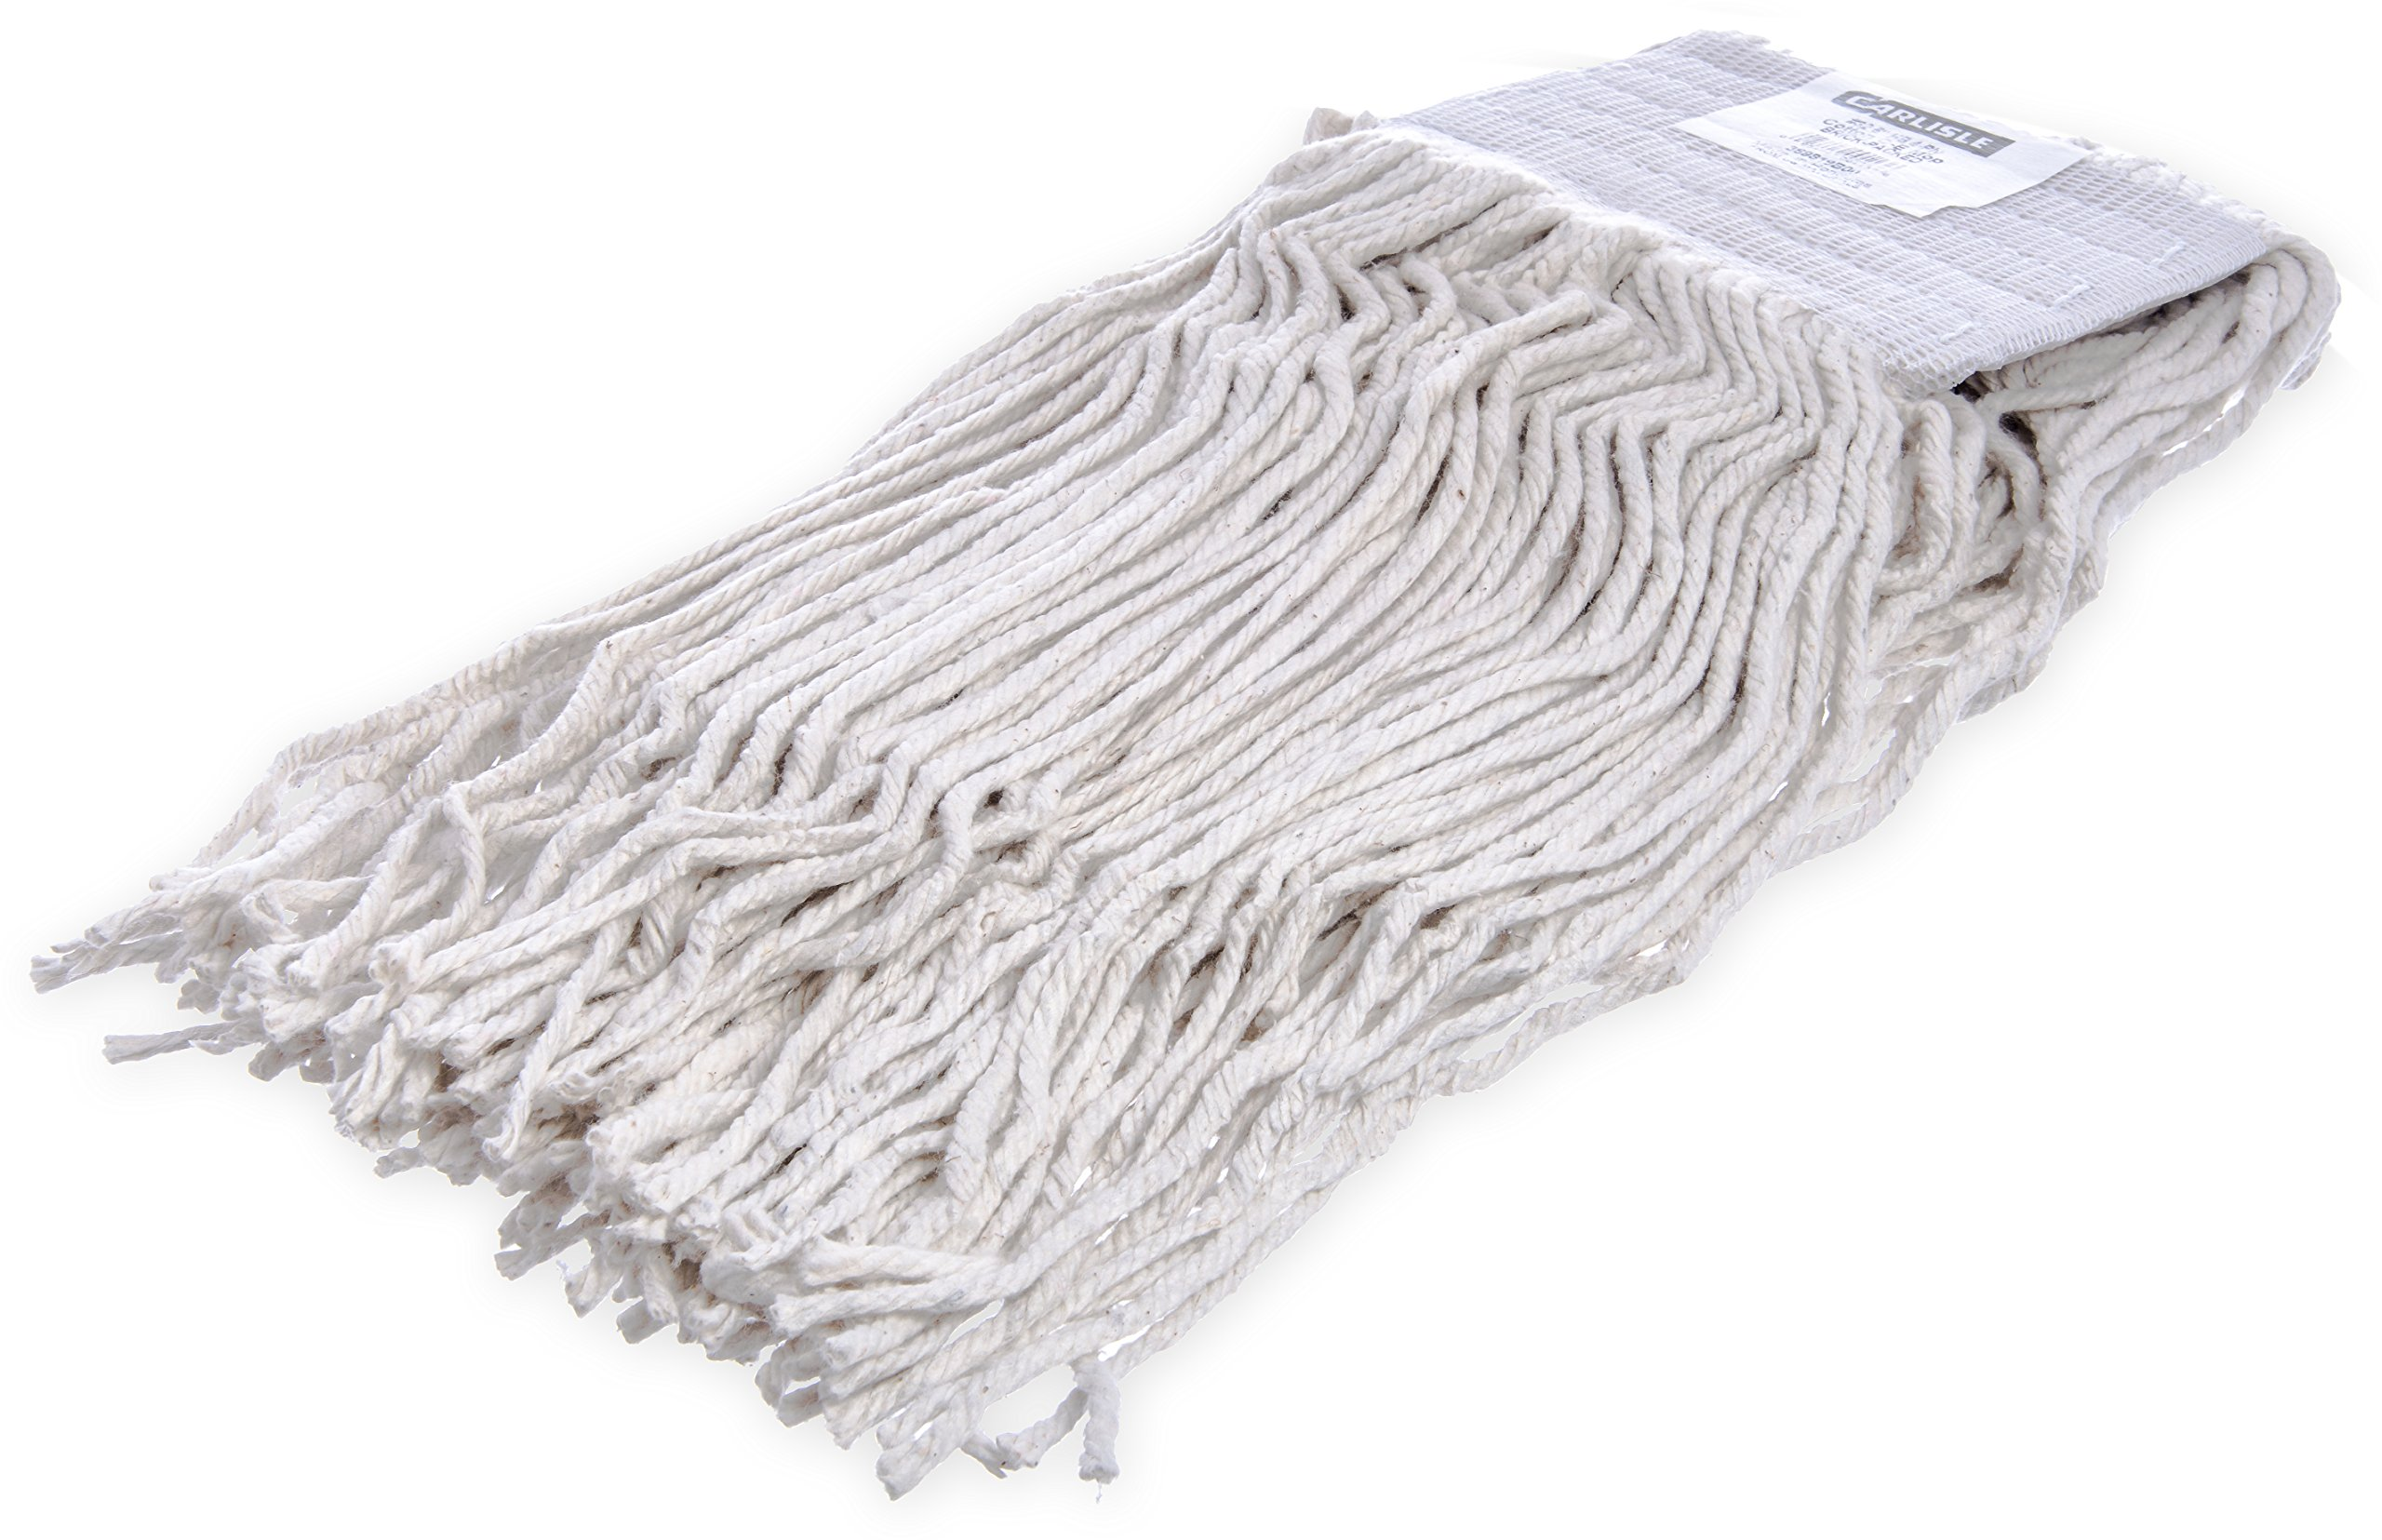 Carlisle 369819B00 #32 5'' Cotton Head Band X-Large Cut-End Wet Mop, White (Case of 12)